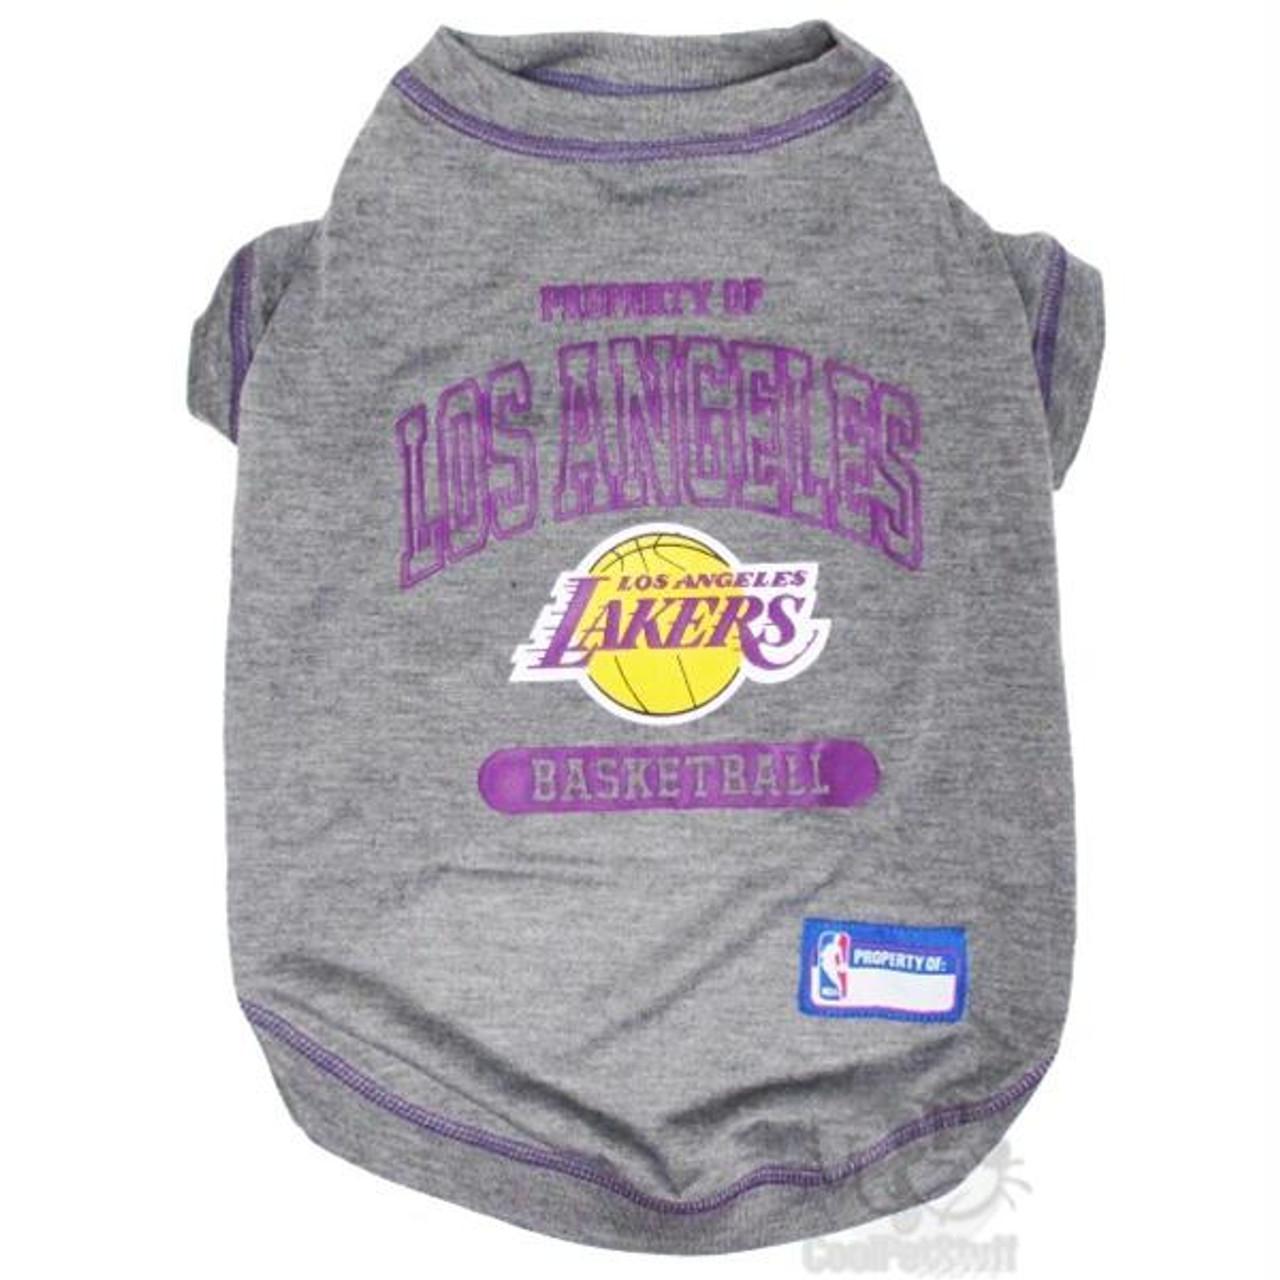 b80d553a442 Los Angeles Lakers Pet T-Shirt | PupRwear